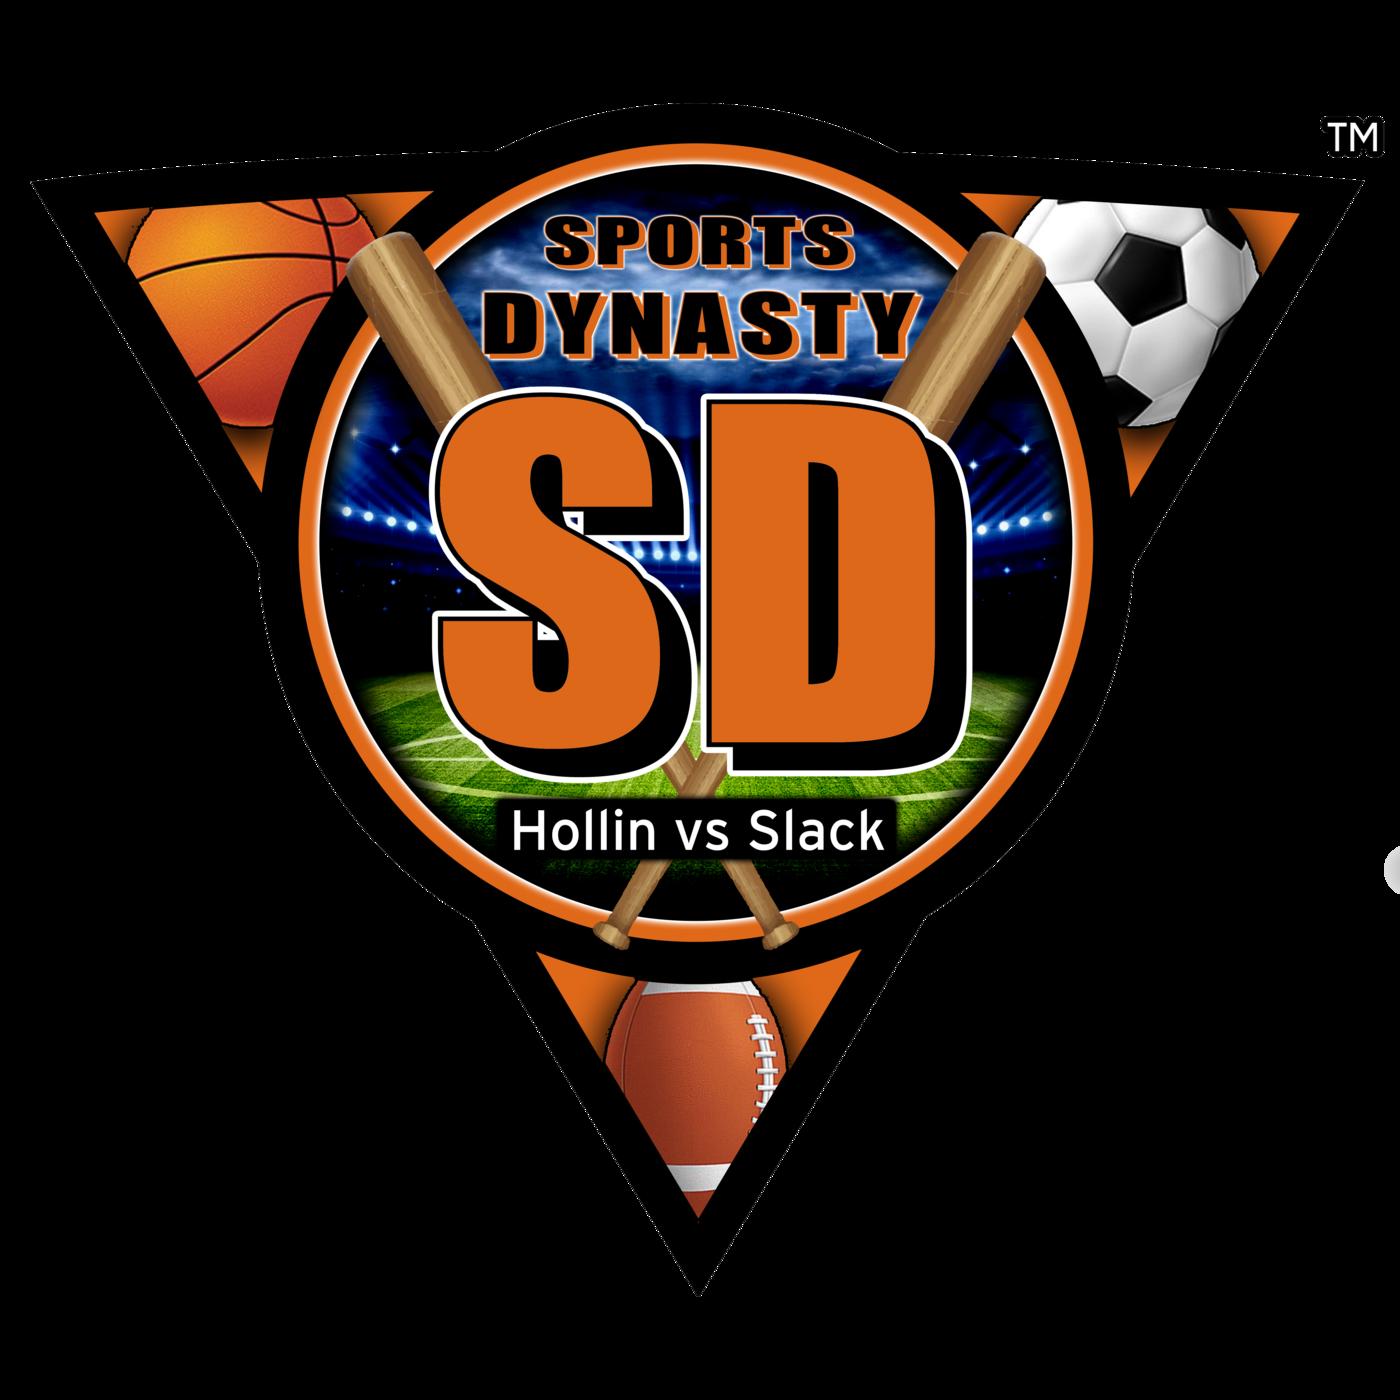 Sports Dynasty